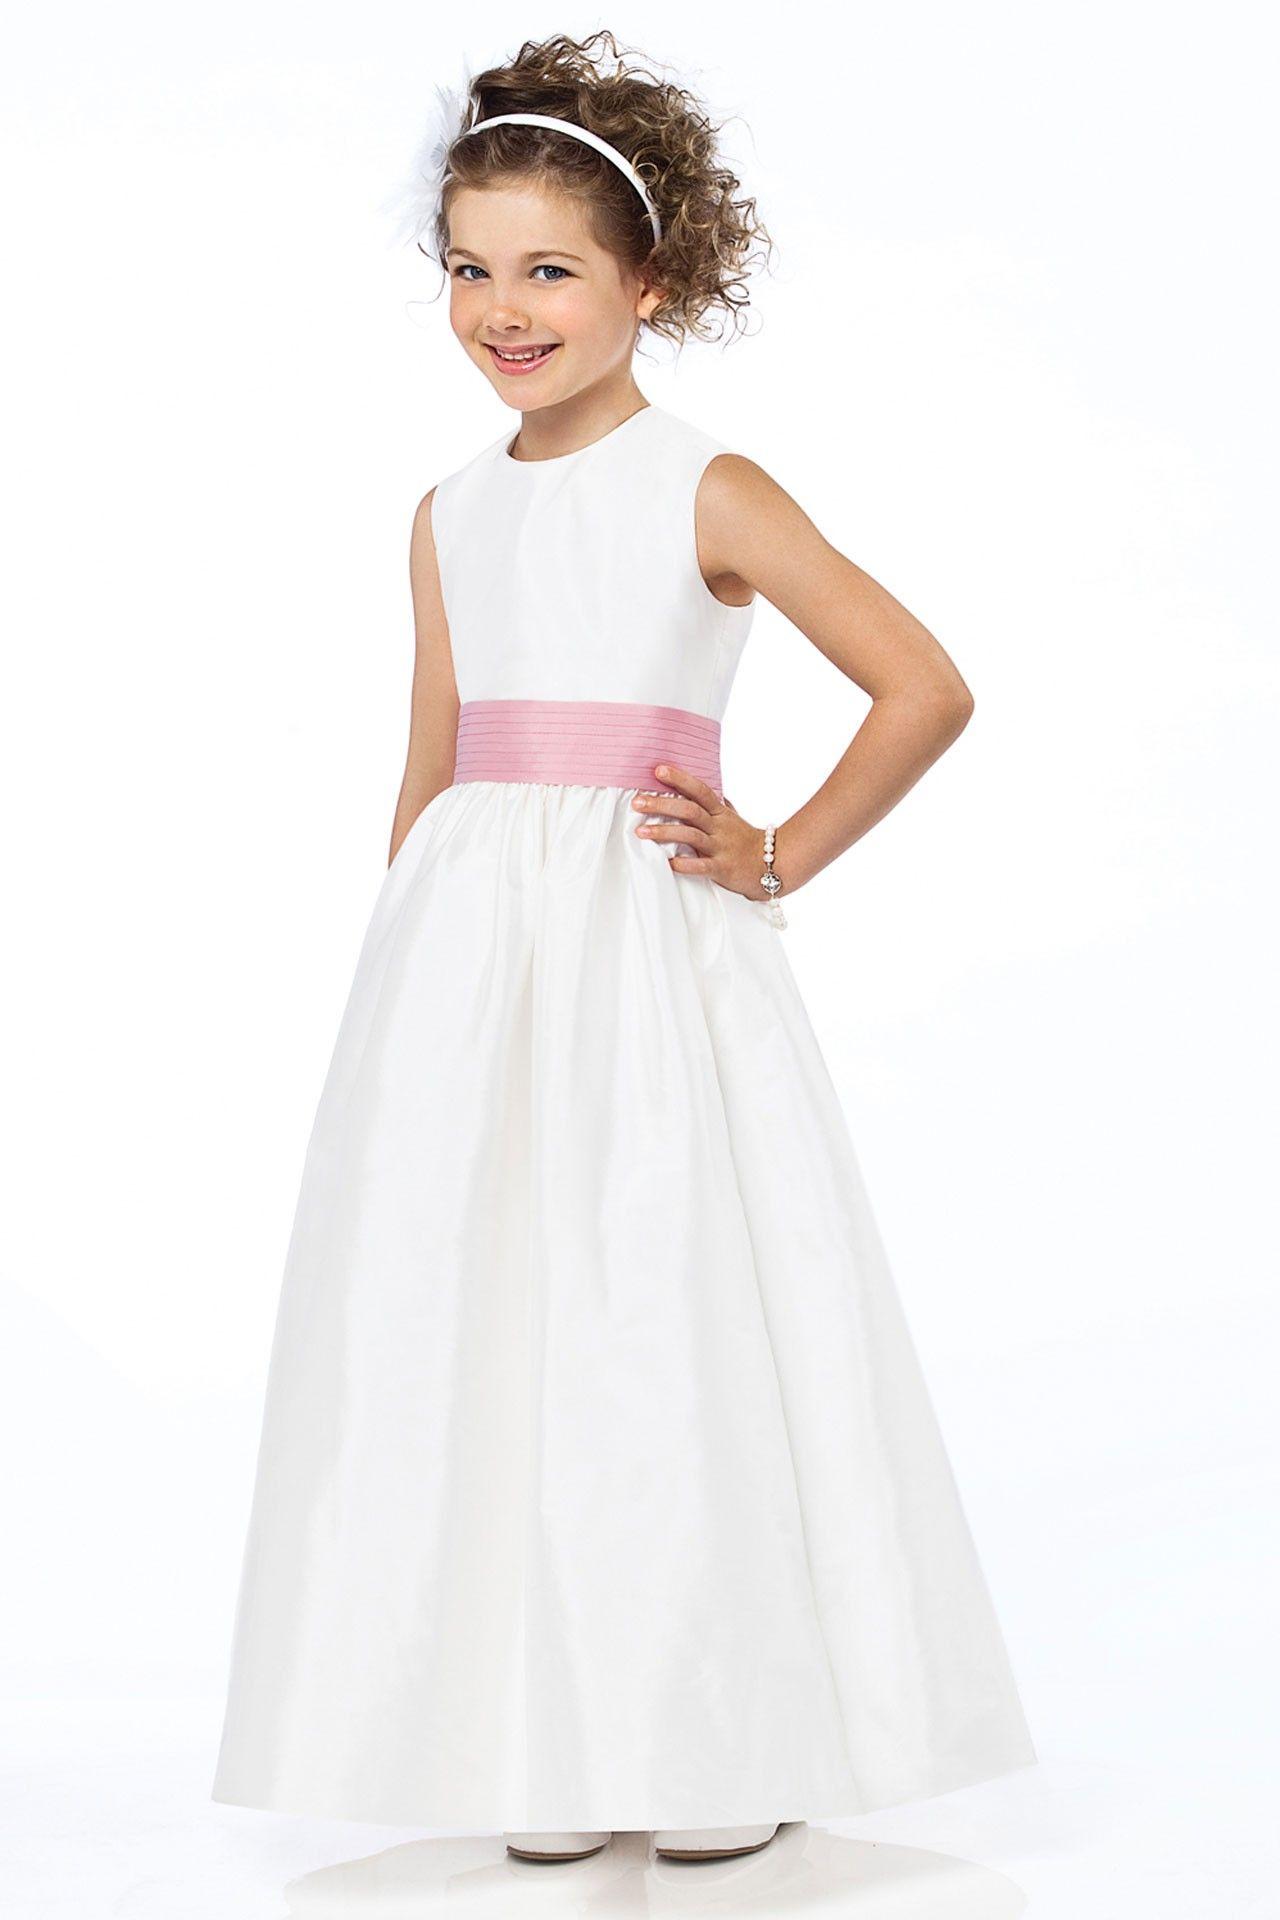 Flower girl dresses u page boy outfits bridesmagazine